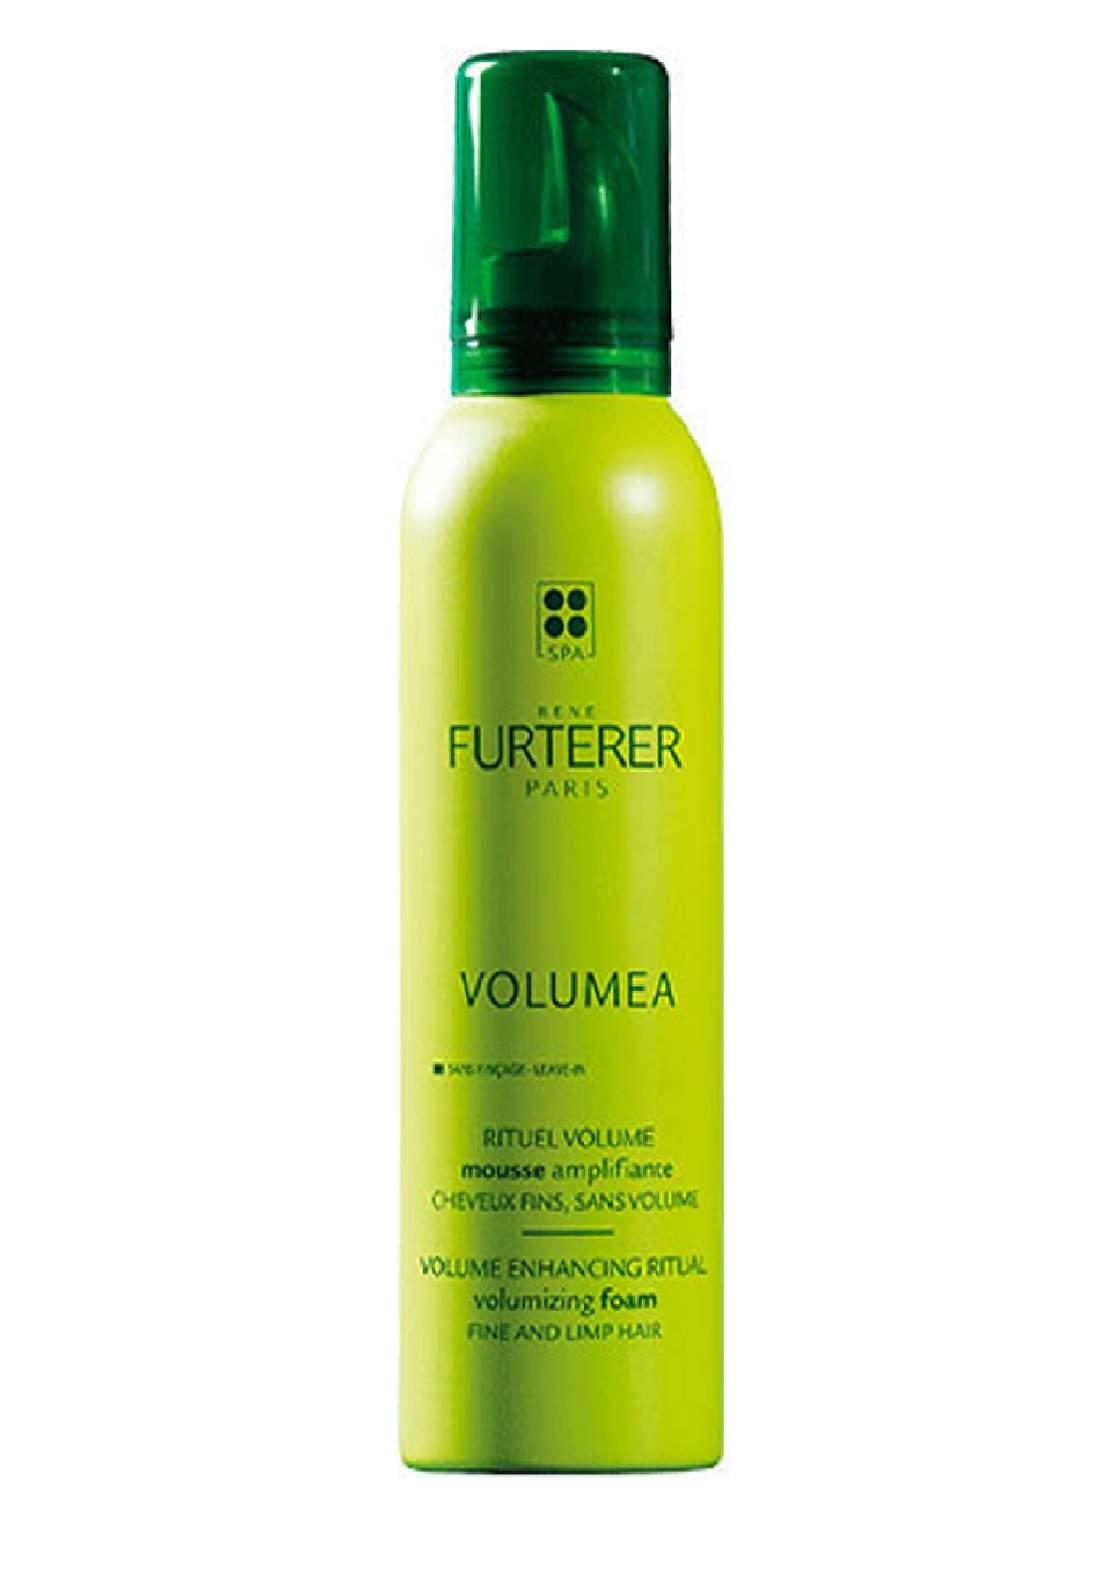 rene furterer volumea volumizing conditioning spray 125MLسبري مكثف شعر